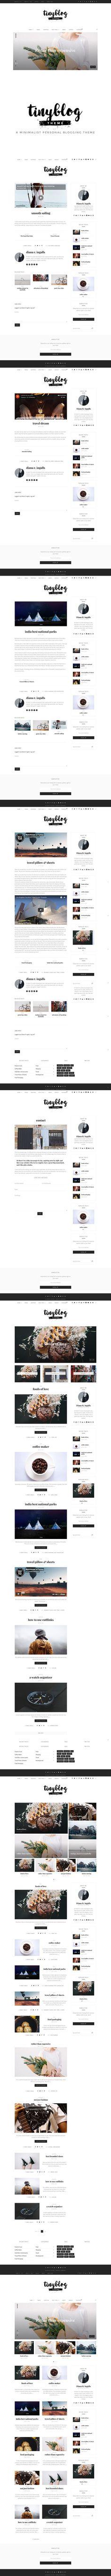 tinyblog - minimalist personal blog. WordPress Blog Themes. $39.00